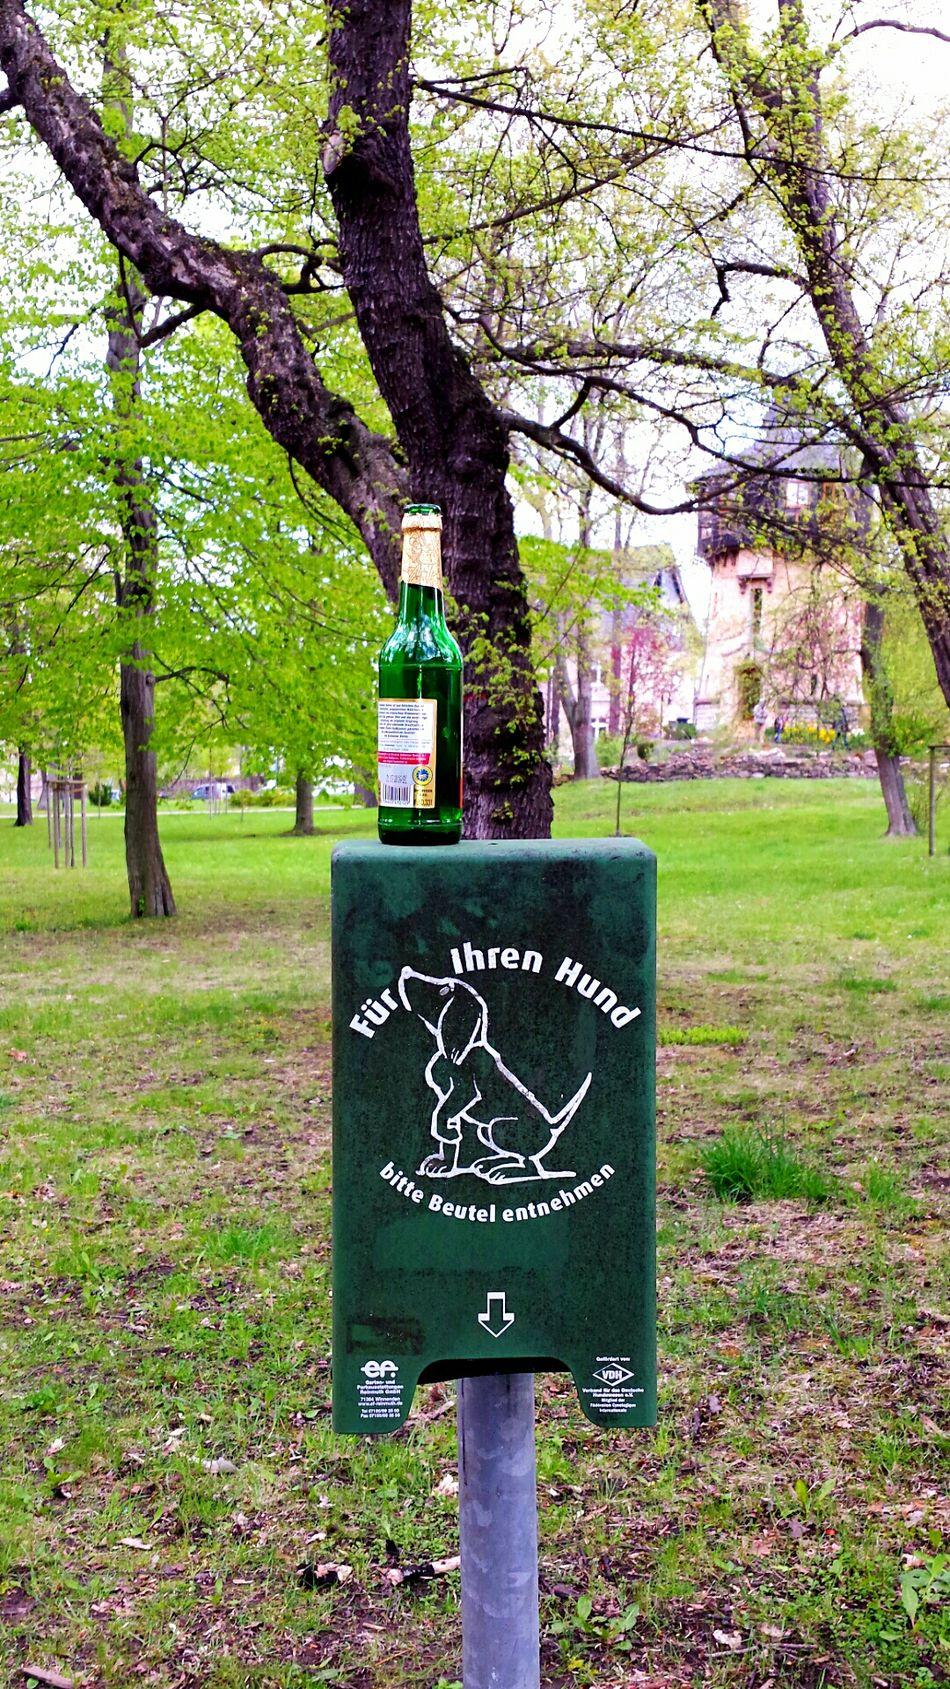 I Love My Dog Funny Stuff Funny Pics Still Life Stillleben Funny Moments Coincidencetography Coincidence Popular Photos Beliebte Fotos Dogfood ???😉 Trash Art Trash Box Spaß Fun Funny City Trash...